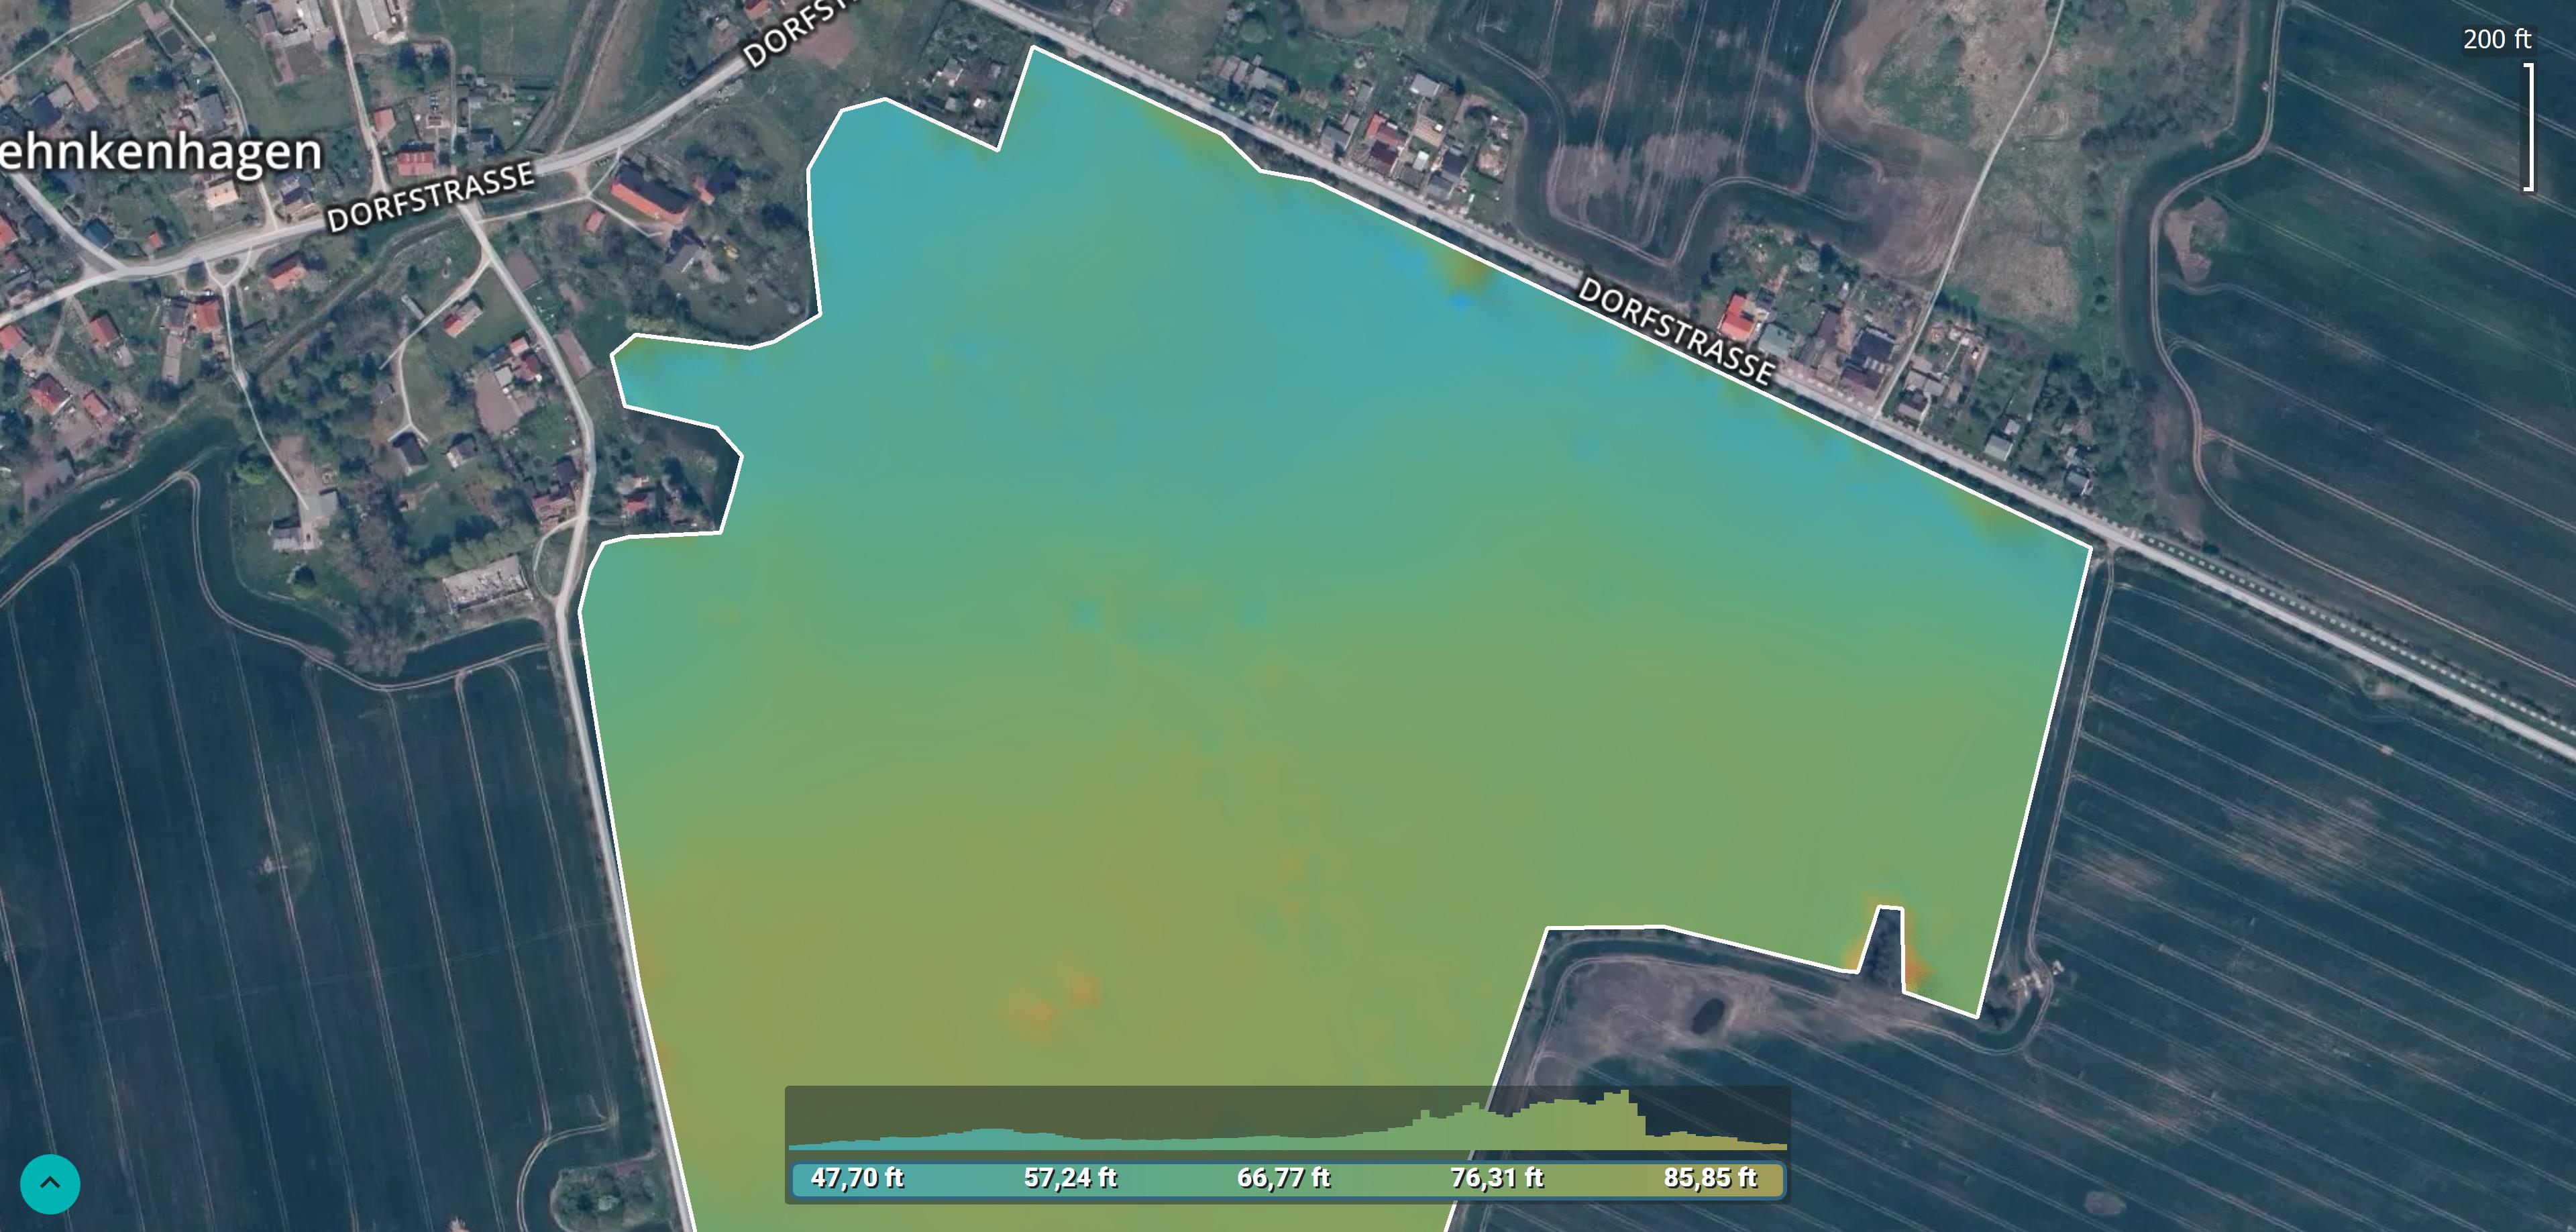 Pix4Dfields 1.4 DSM map